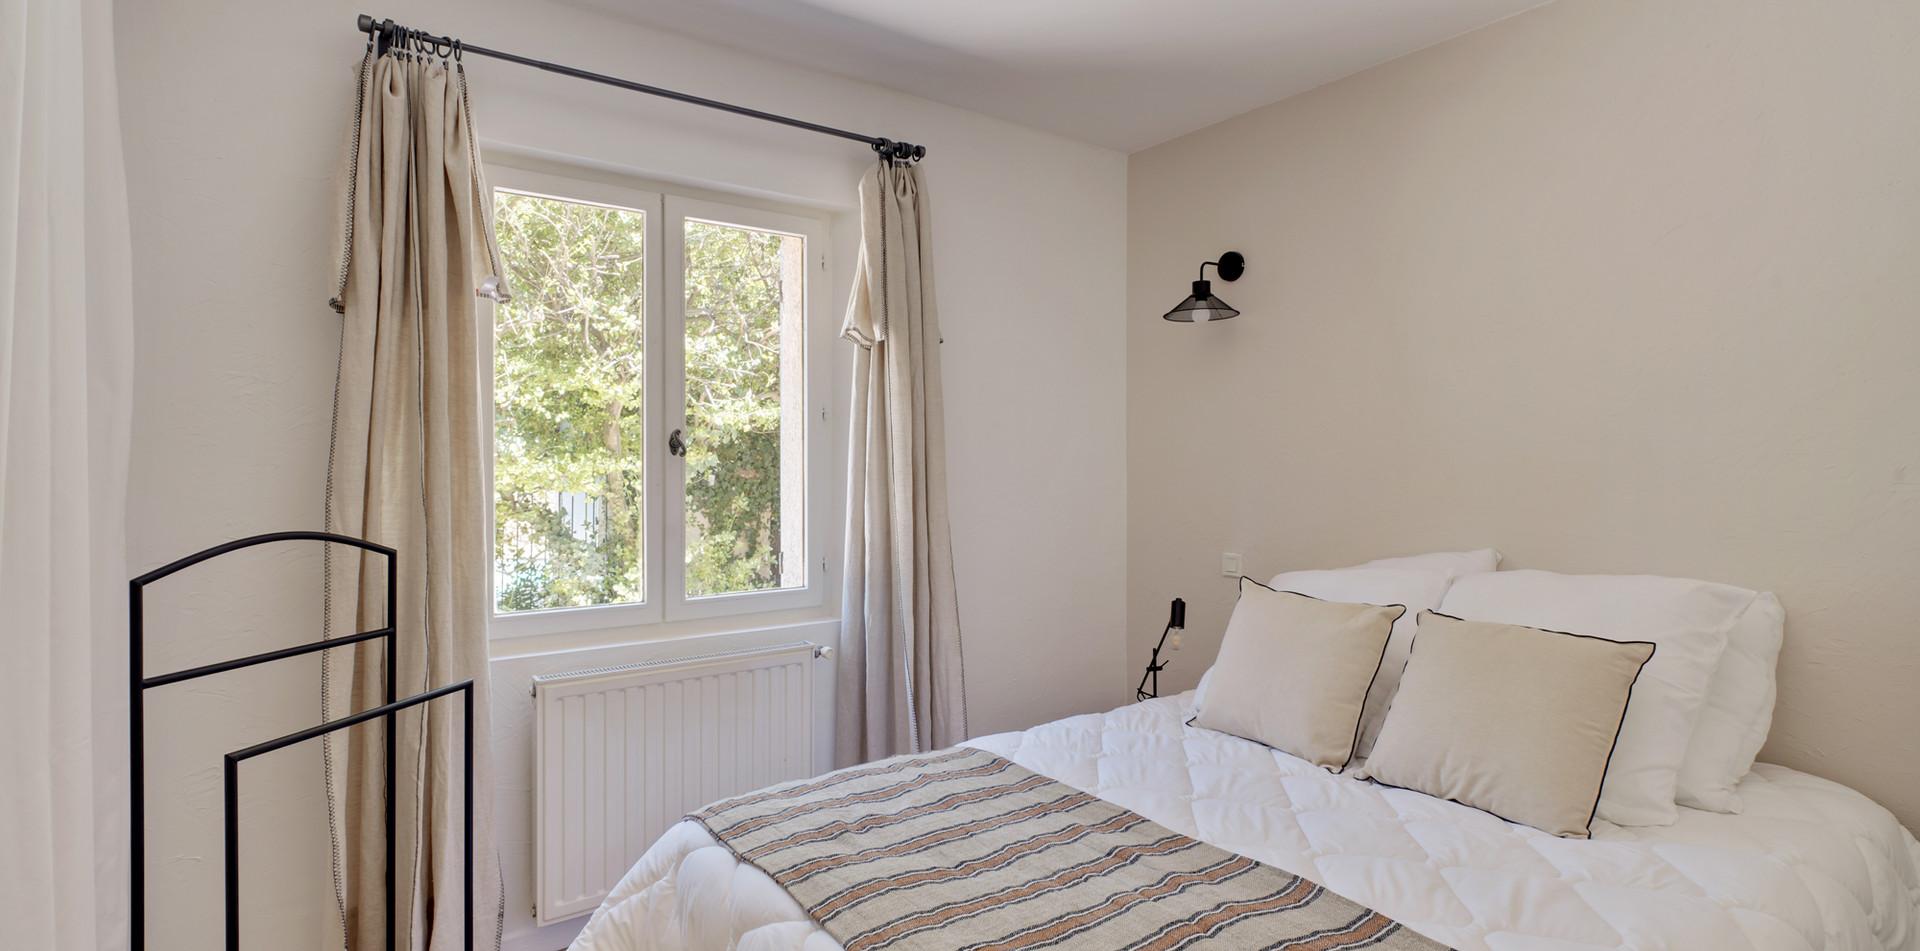 Maiosn des Rêveurs, bedroom 1, Mas Saint-Gens